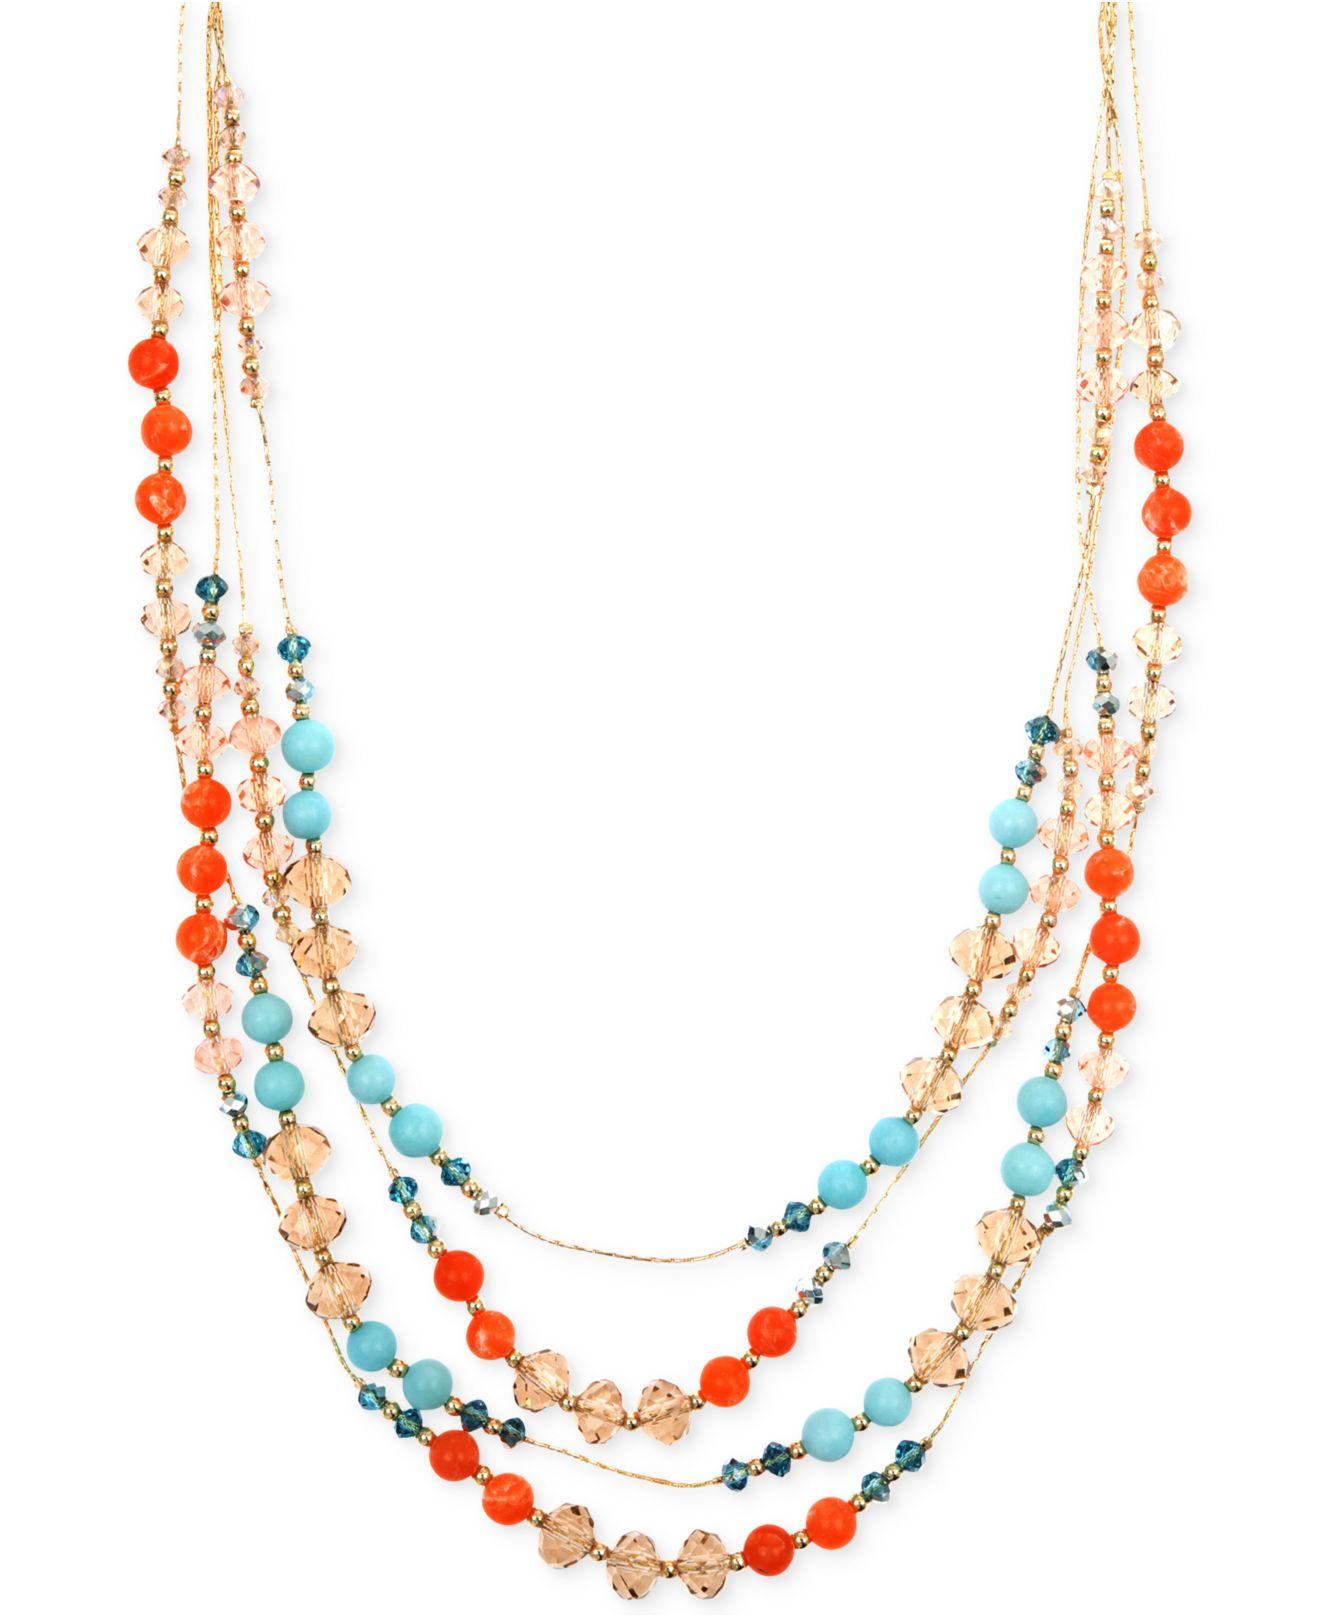 jones new york gold tone mixed bead multi row necklace lyst. Black Bedroom Furniture Sets. Home Design Ideas